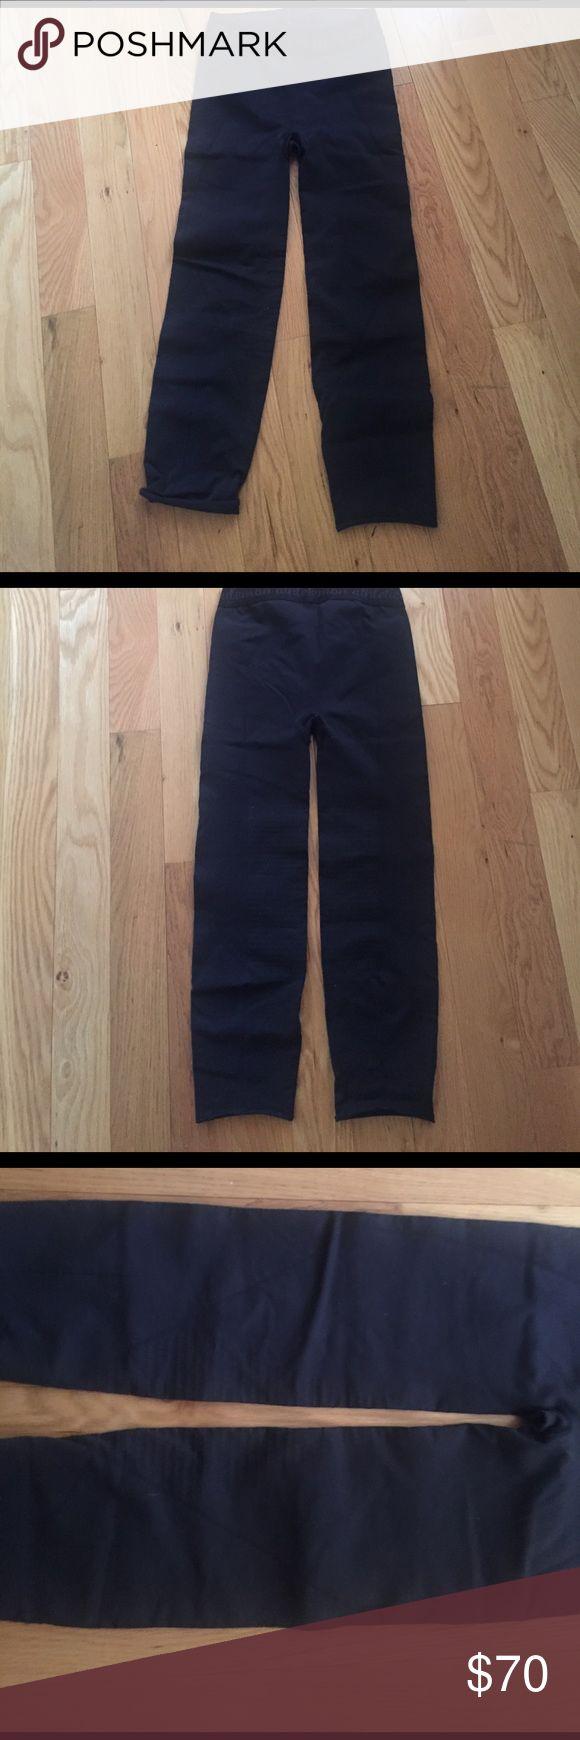 Lululemon 7/8 length thick leggings Lululemon 7/8 length thick leggings lululemon athletica Pants Track Pants & Joggers